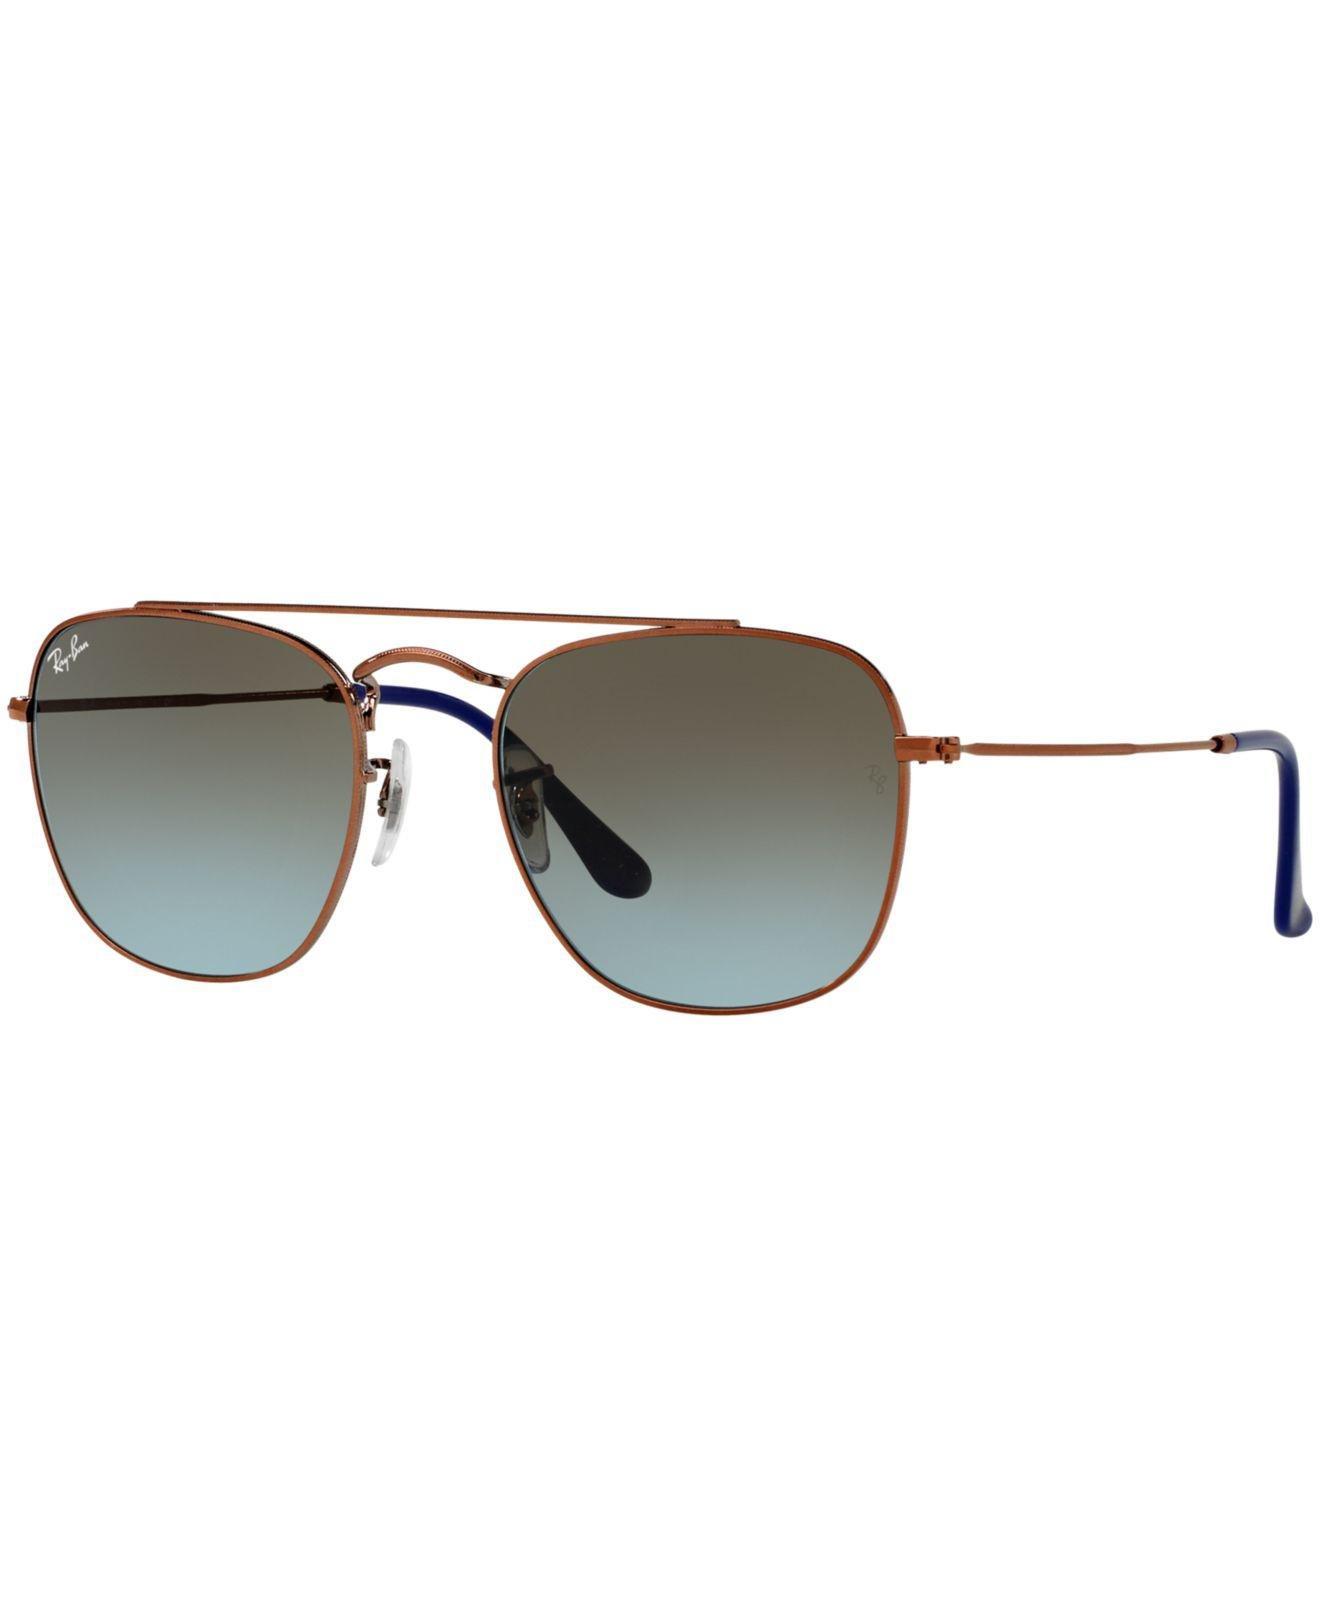 e4efb3e4663 Ray-Ban. Men s Sunglasses ...